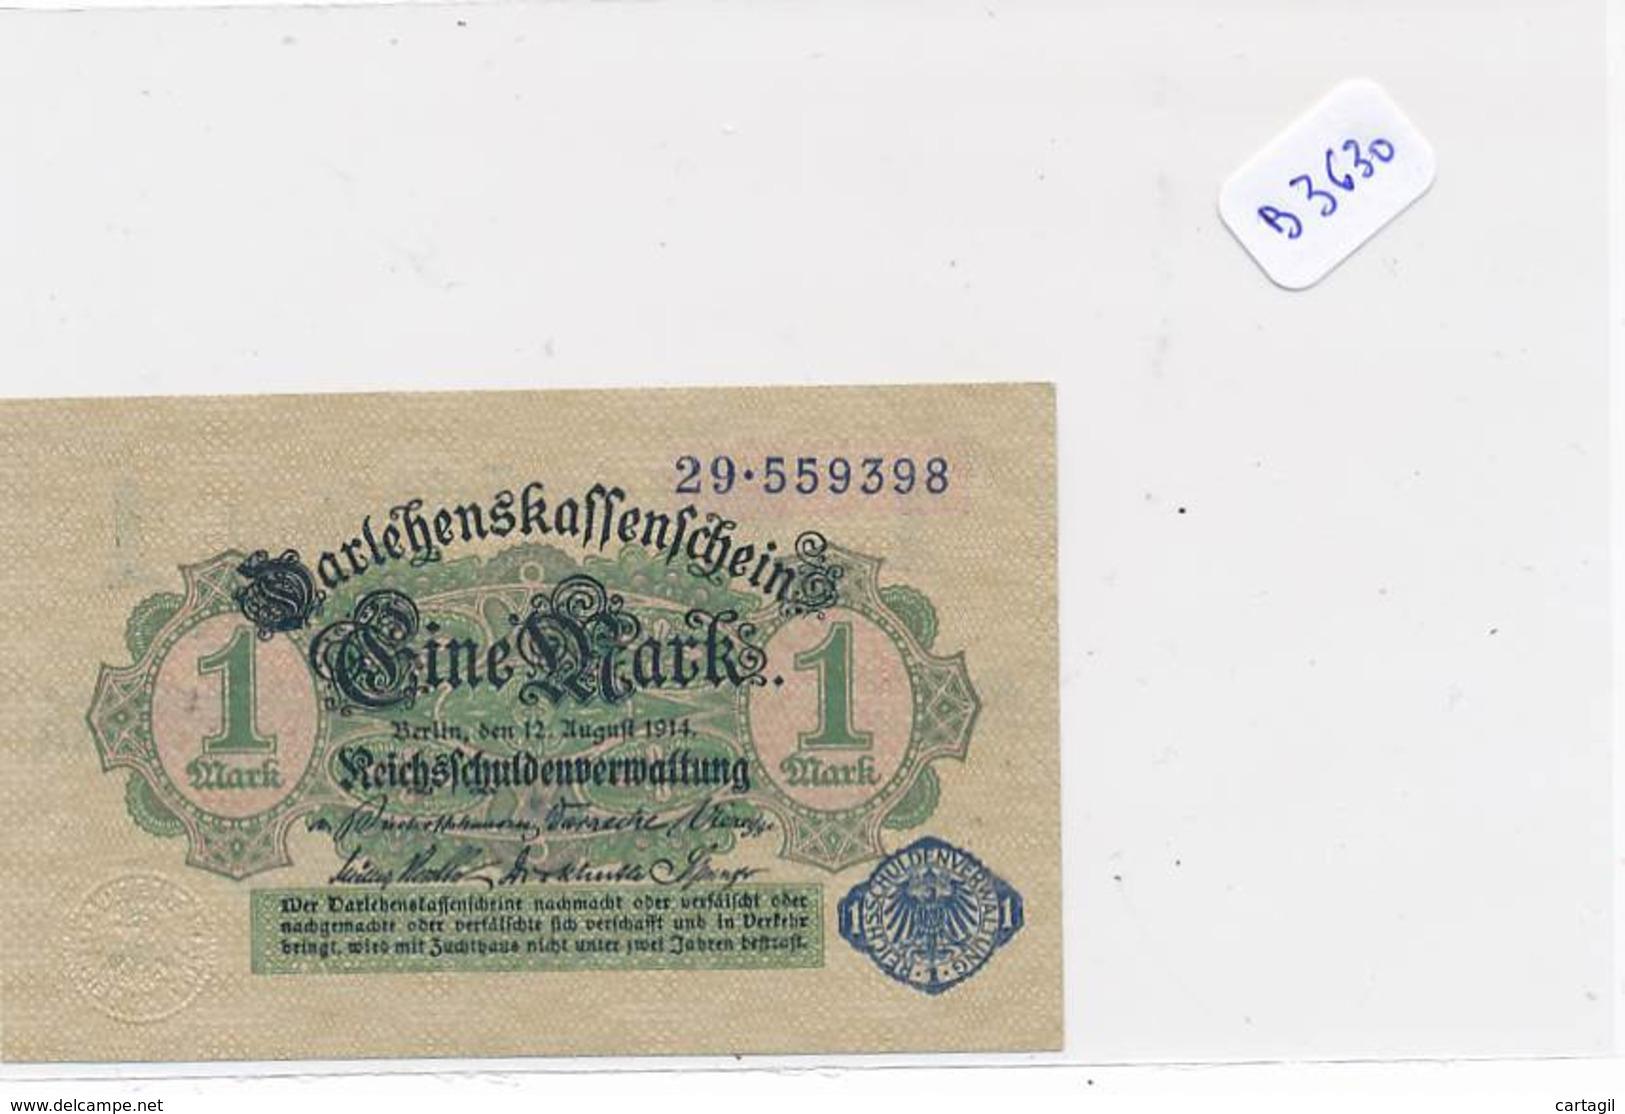 Numismatique -B3630 -Allemagne -1Mark Darlehnskassenshein 1914 ( Catégorie,  Nature état ... Scans)-Envoi Gratuit - Altri